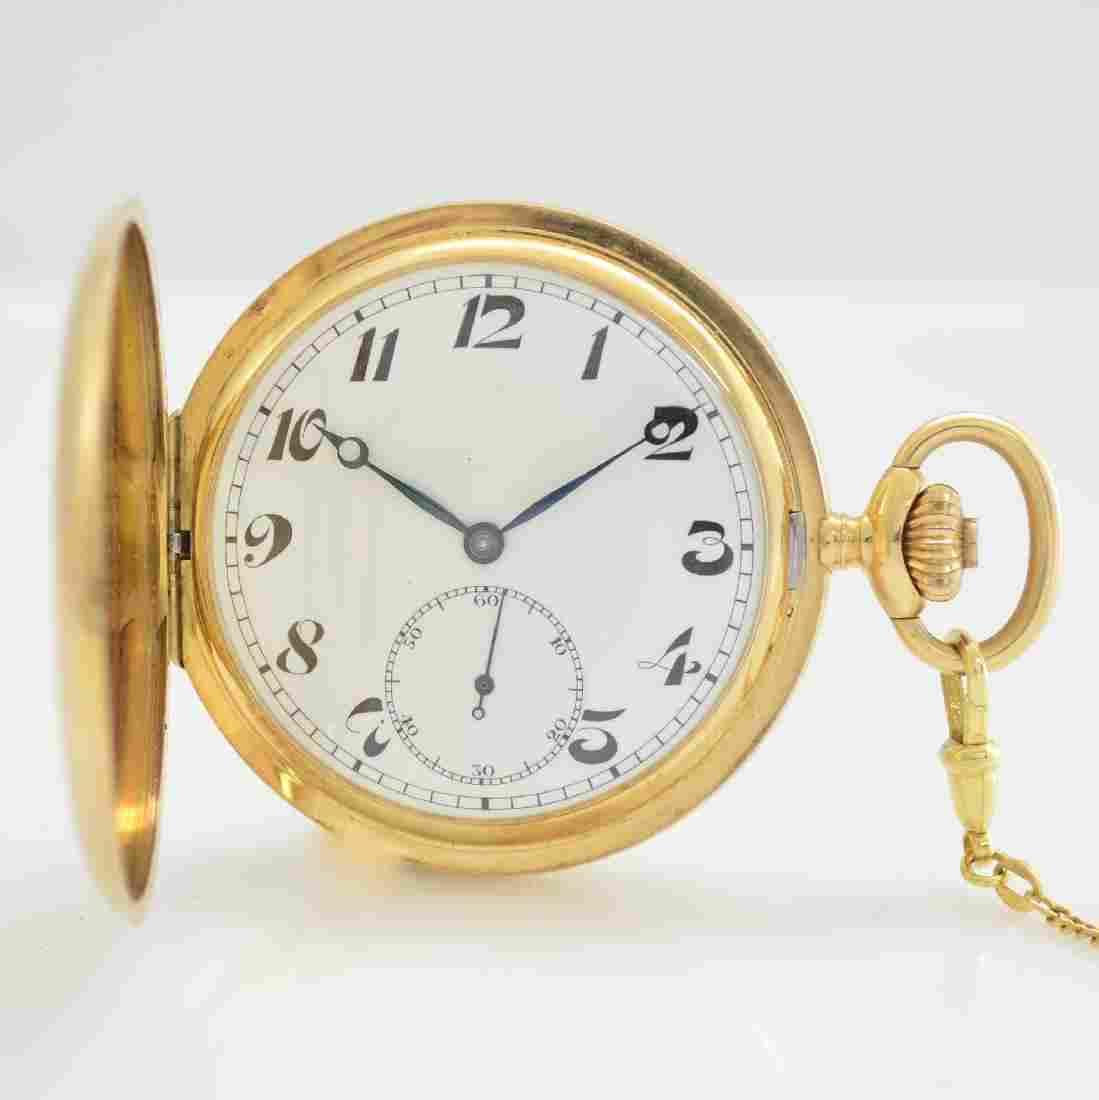 MOERIS 14k yellow gold hunting cased pocket watch